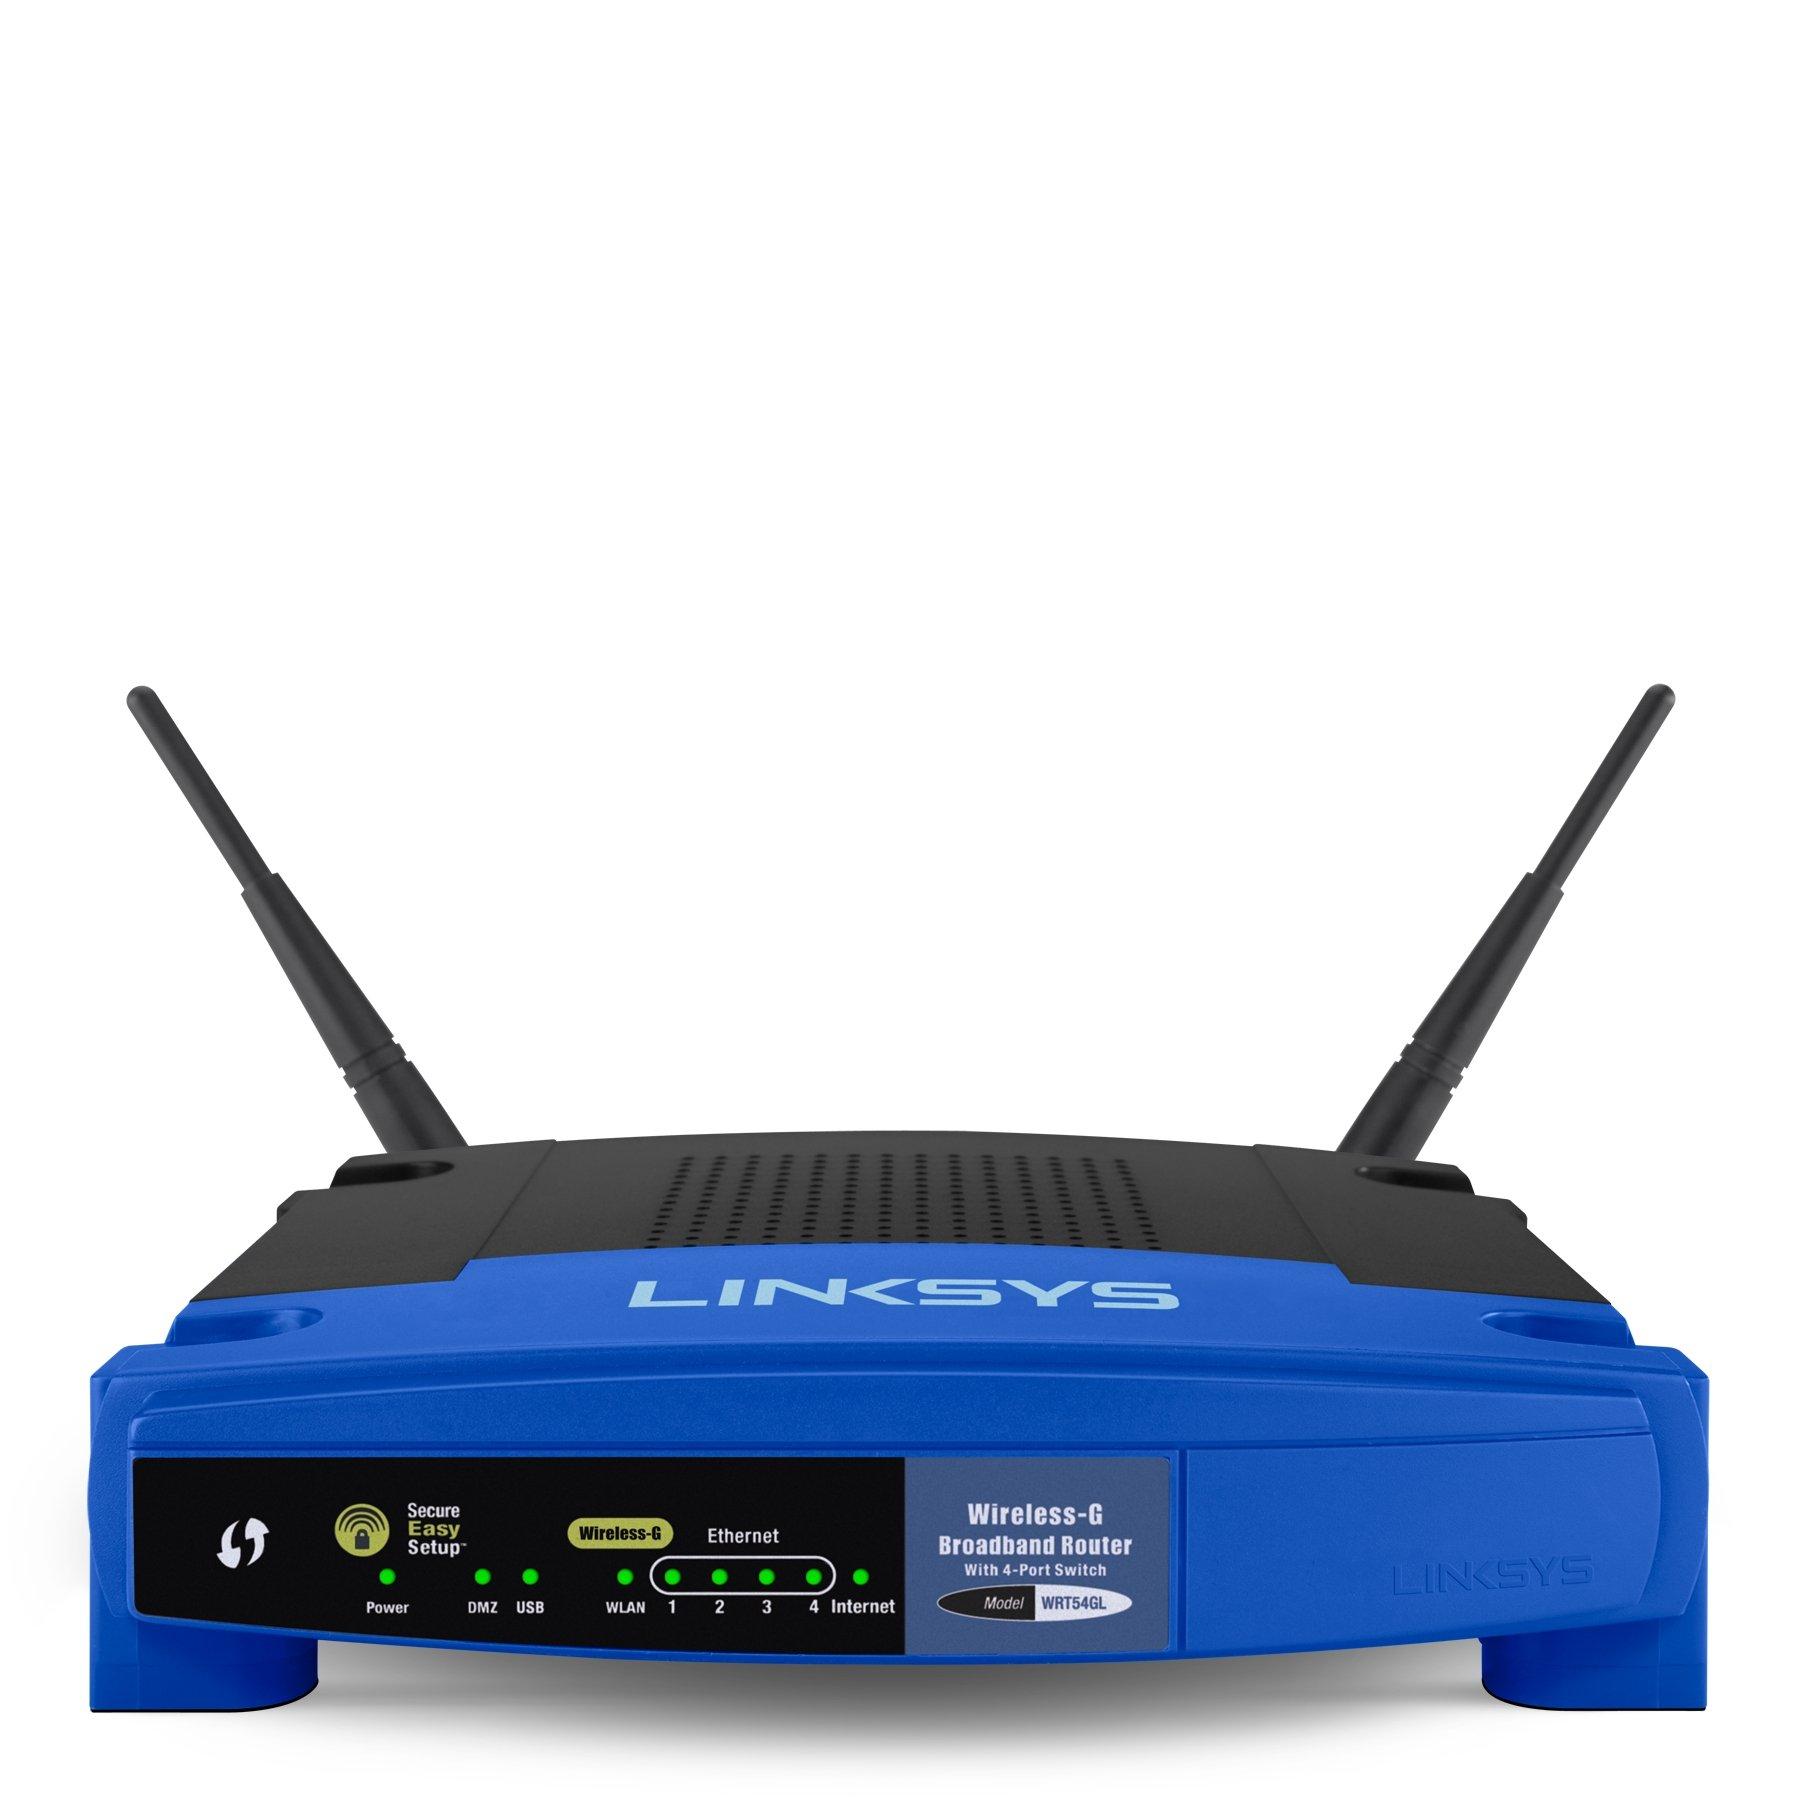 Linksys WRT54GL Wireless G Broadband Router